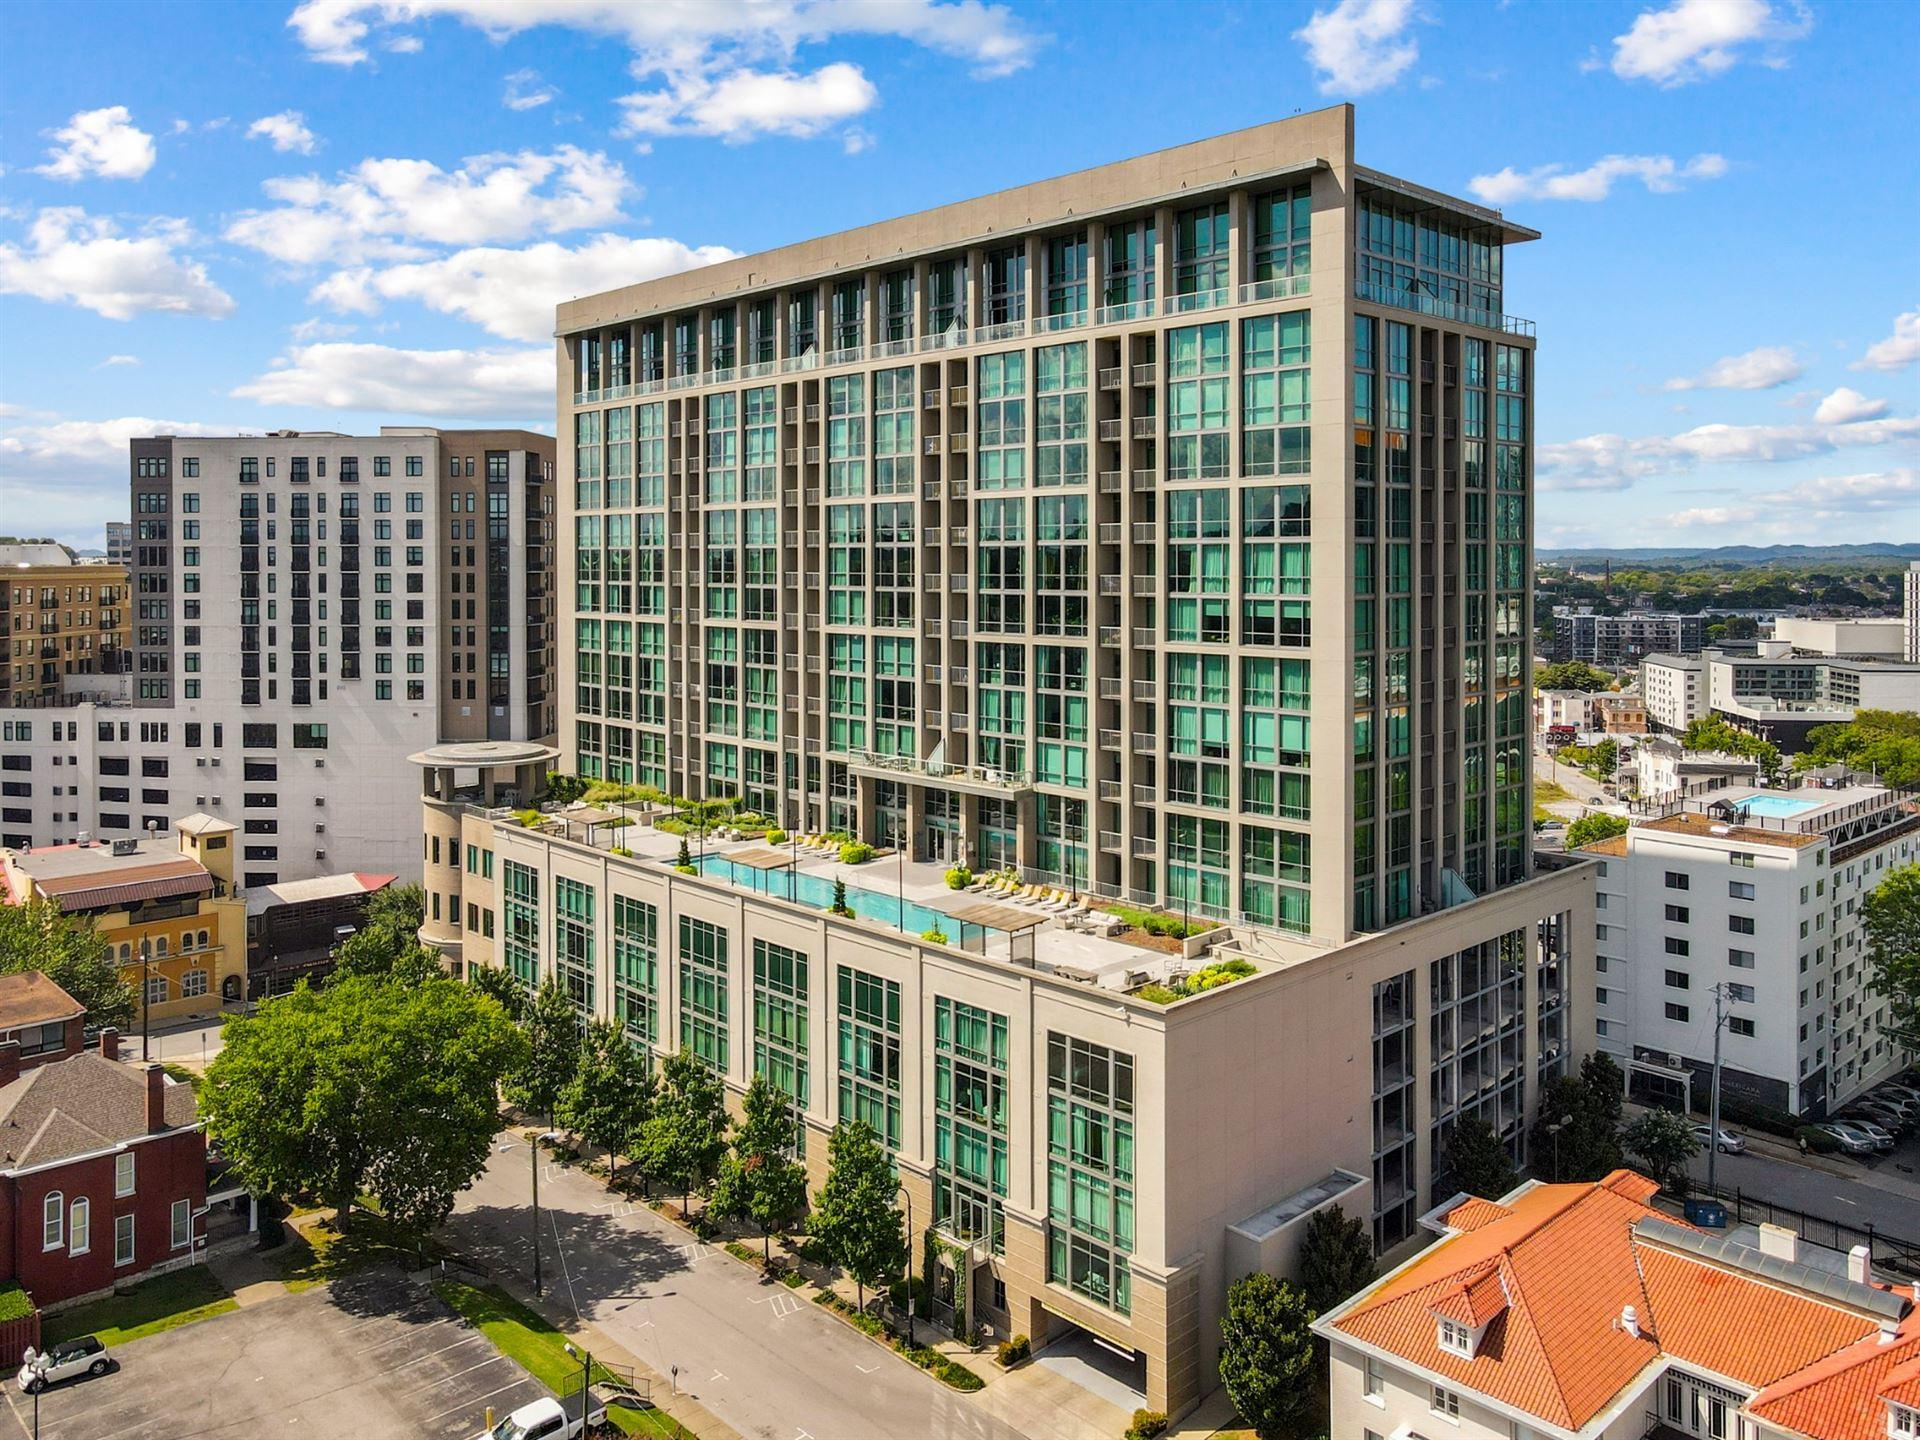 900 20th Ave S #1604, Nashville, TN 37212 - MLS#: 2261379